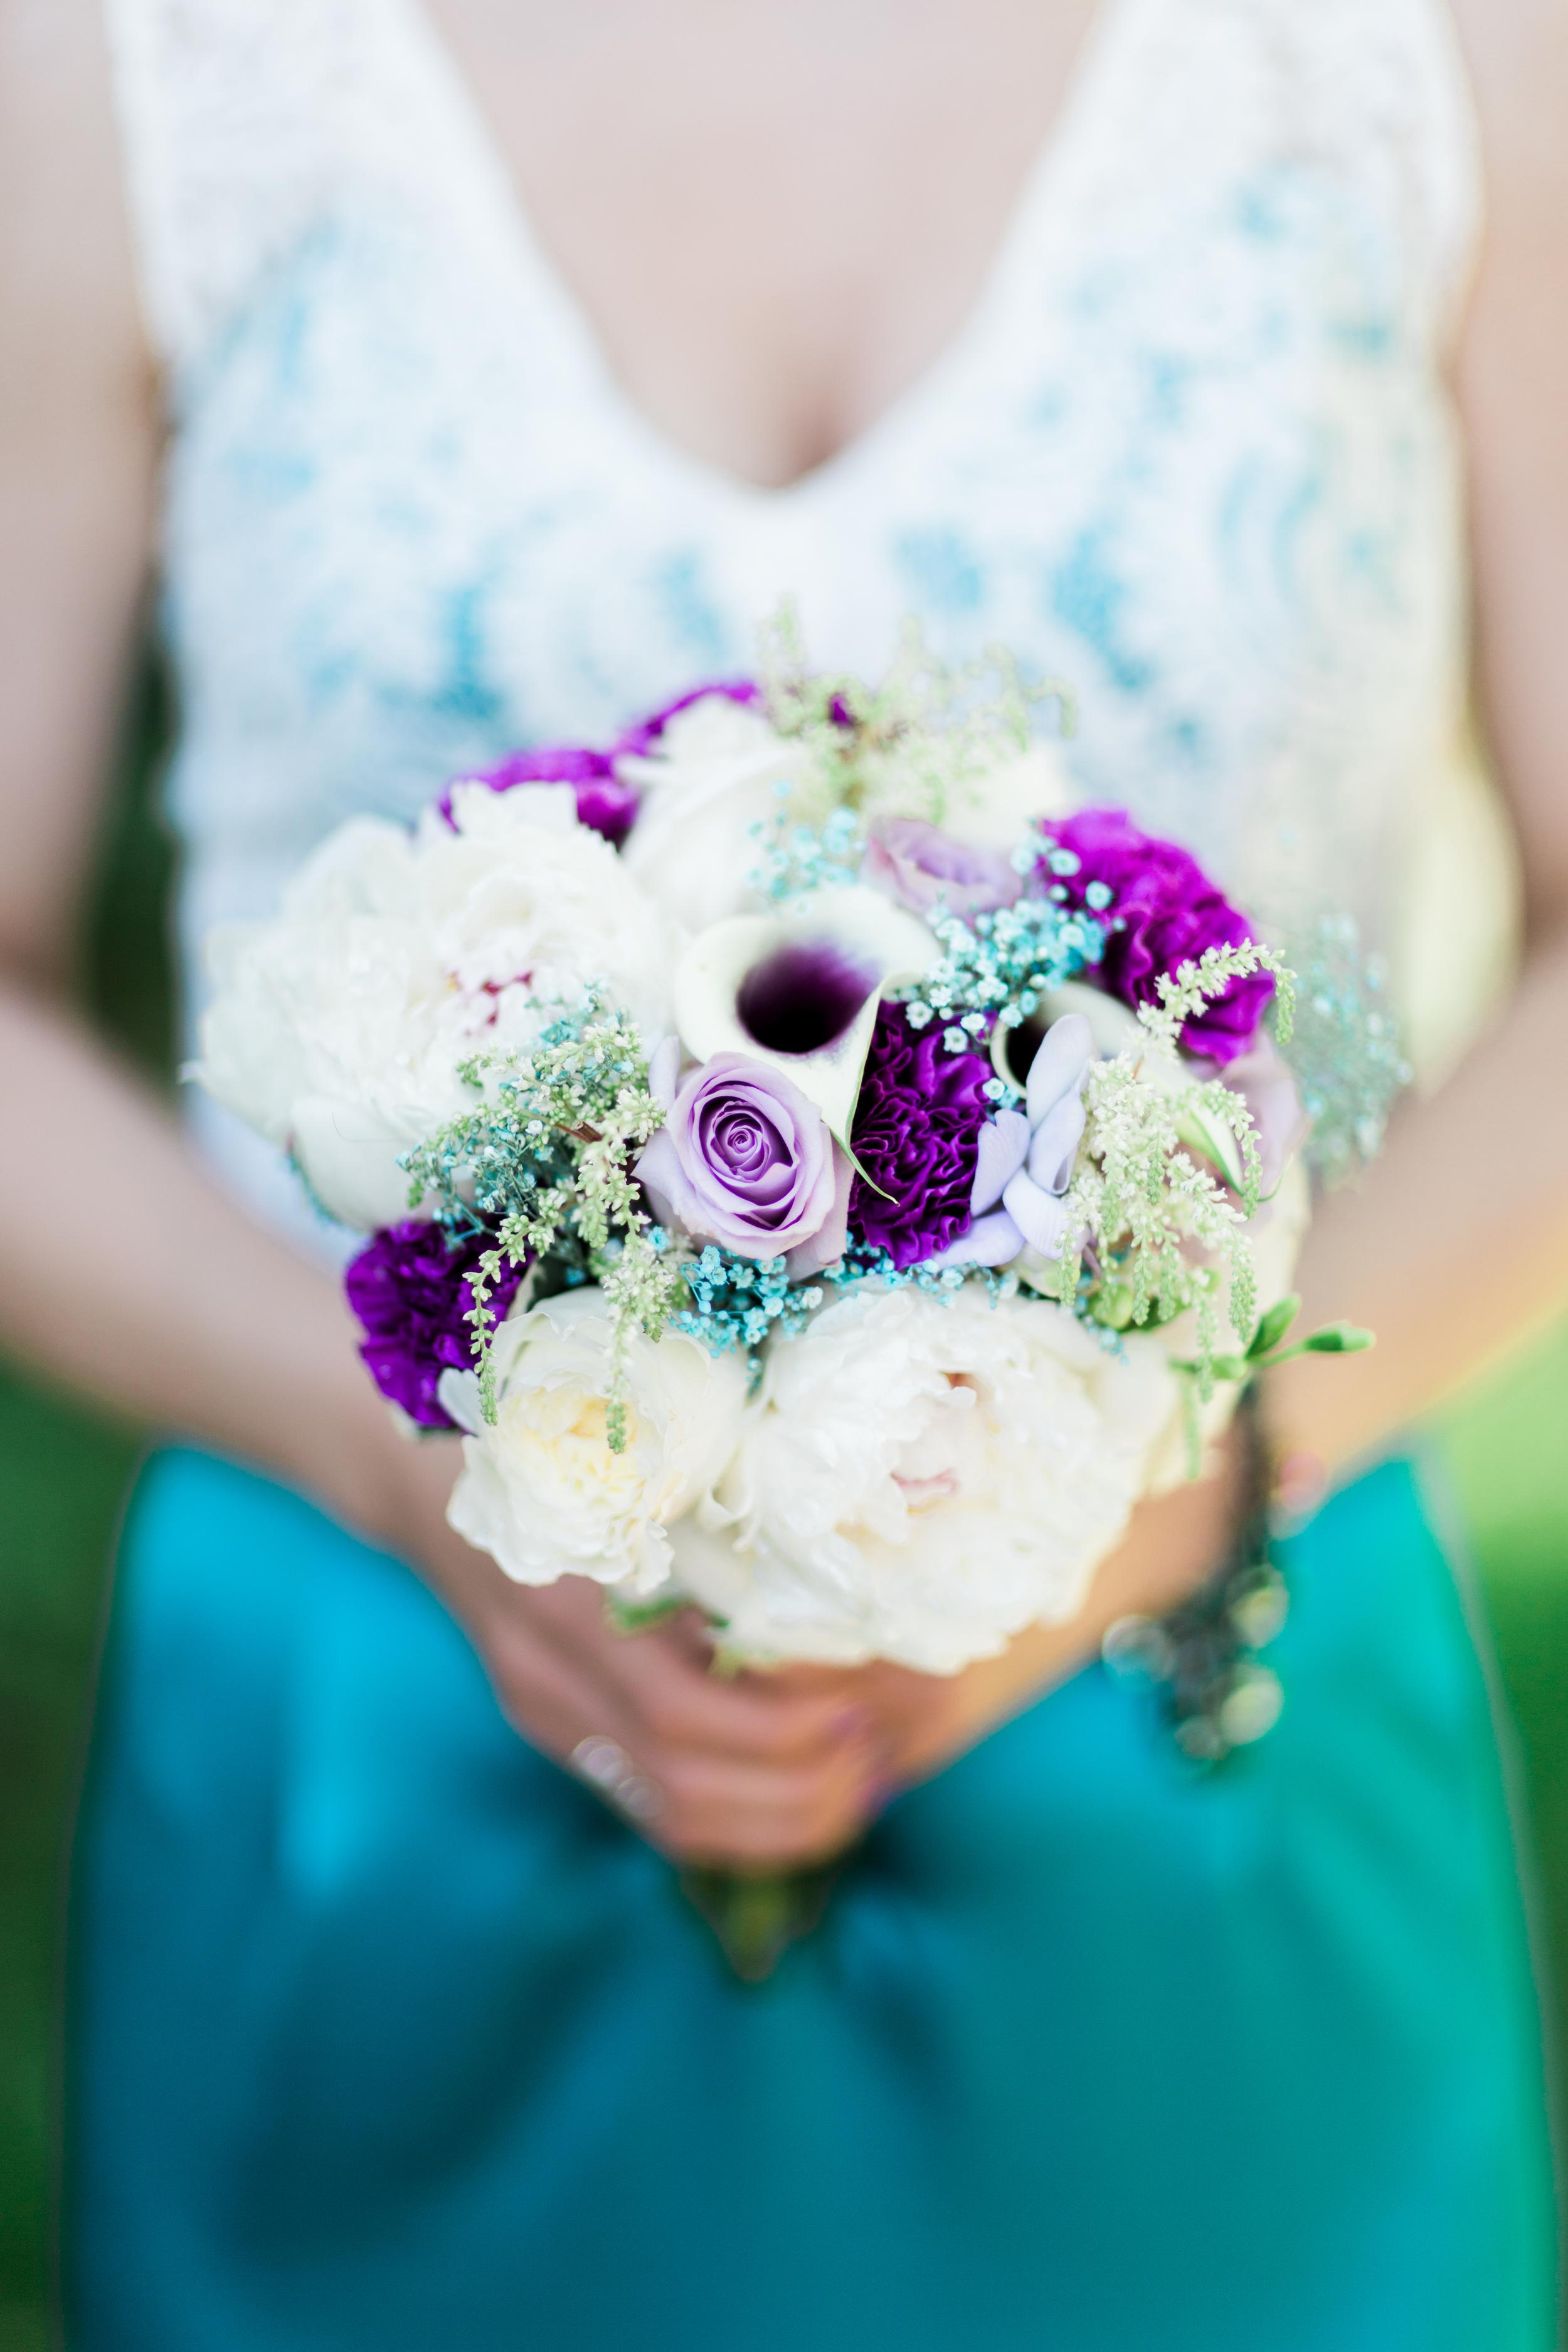 2015-06-13 [Nellie & Robert Wedding]-_MG_0018.jpg